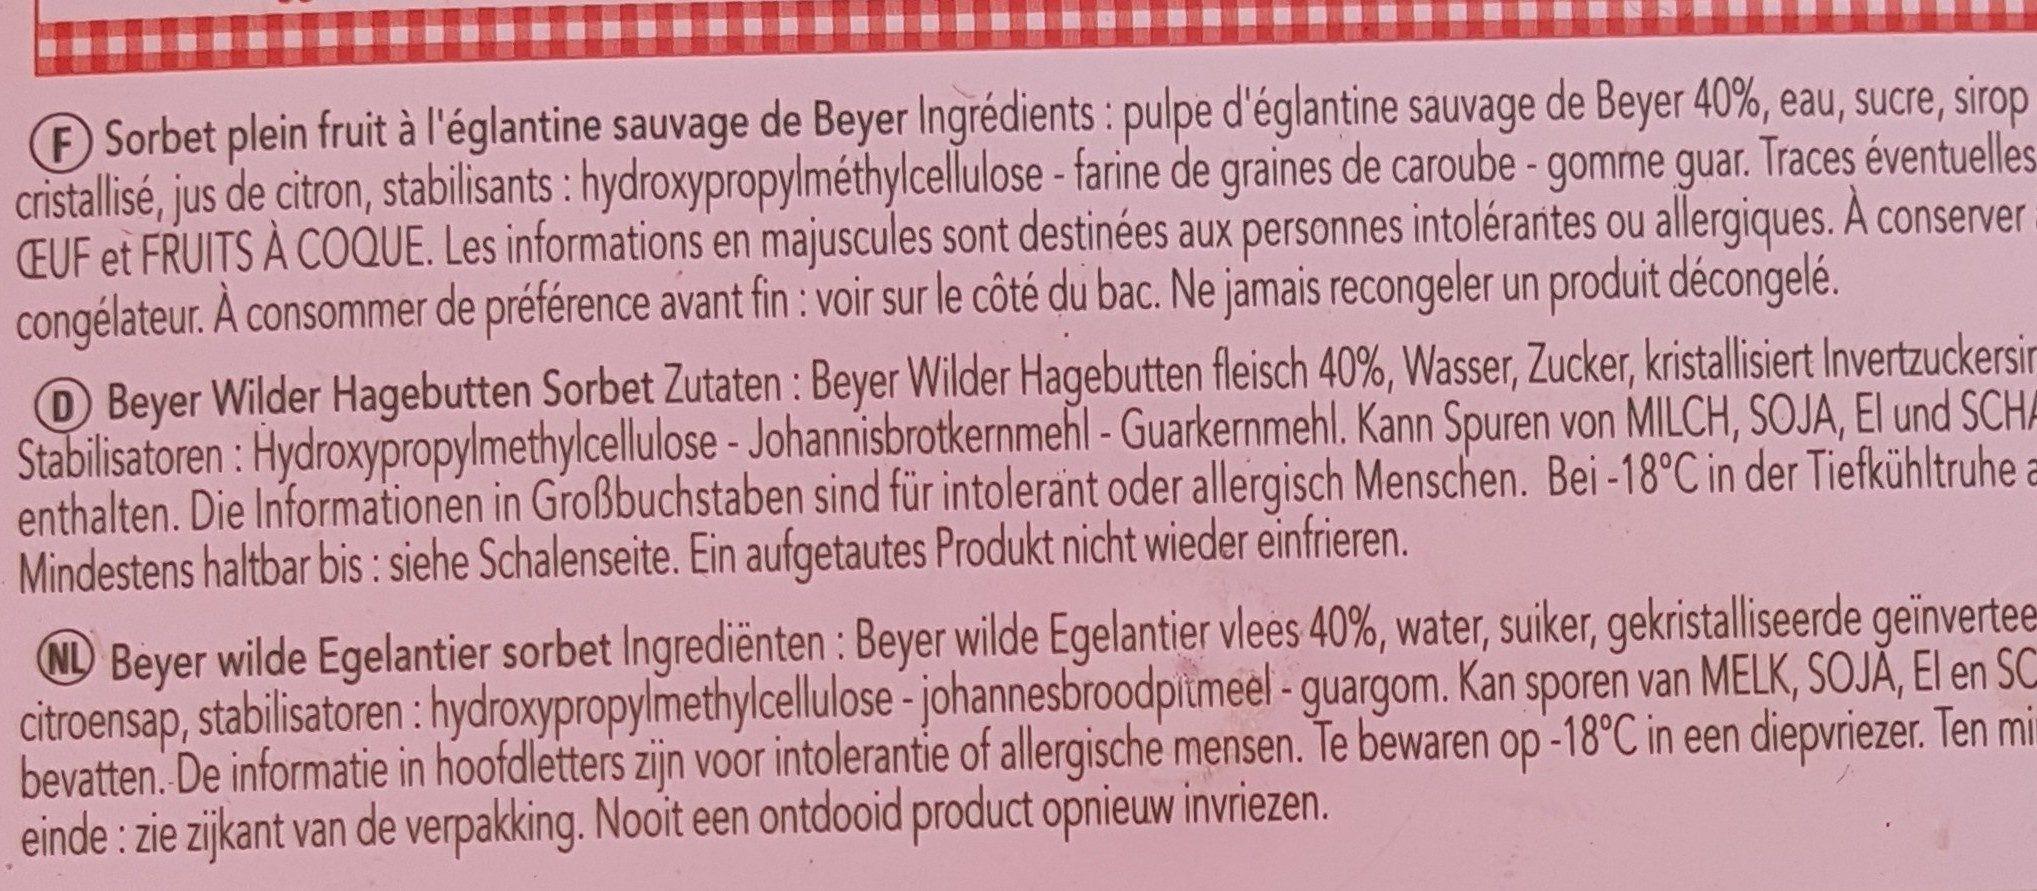 Sorbet eglantine - Ingrediënten